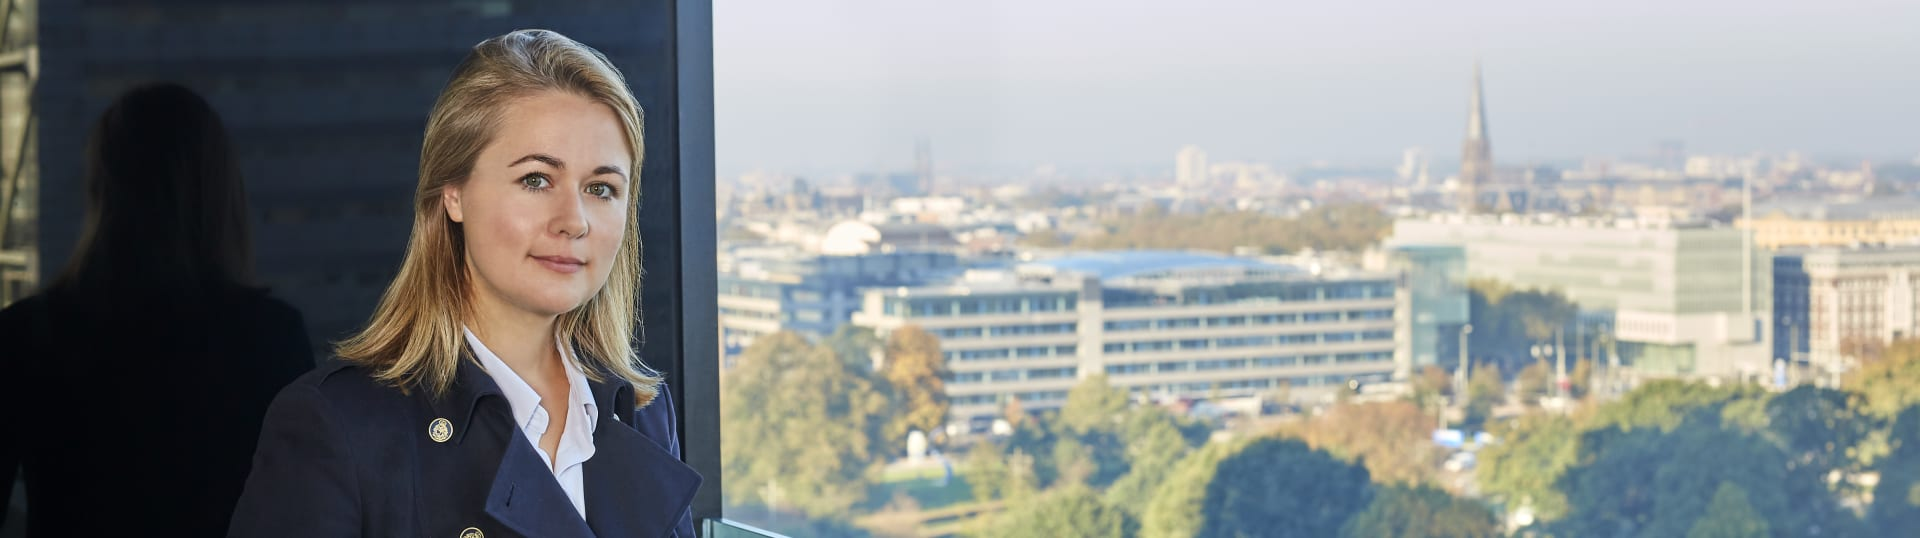 Marije Batting, advocaat Pels Rijcken